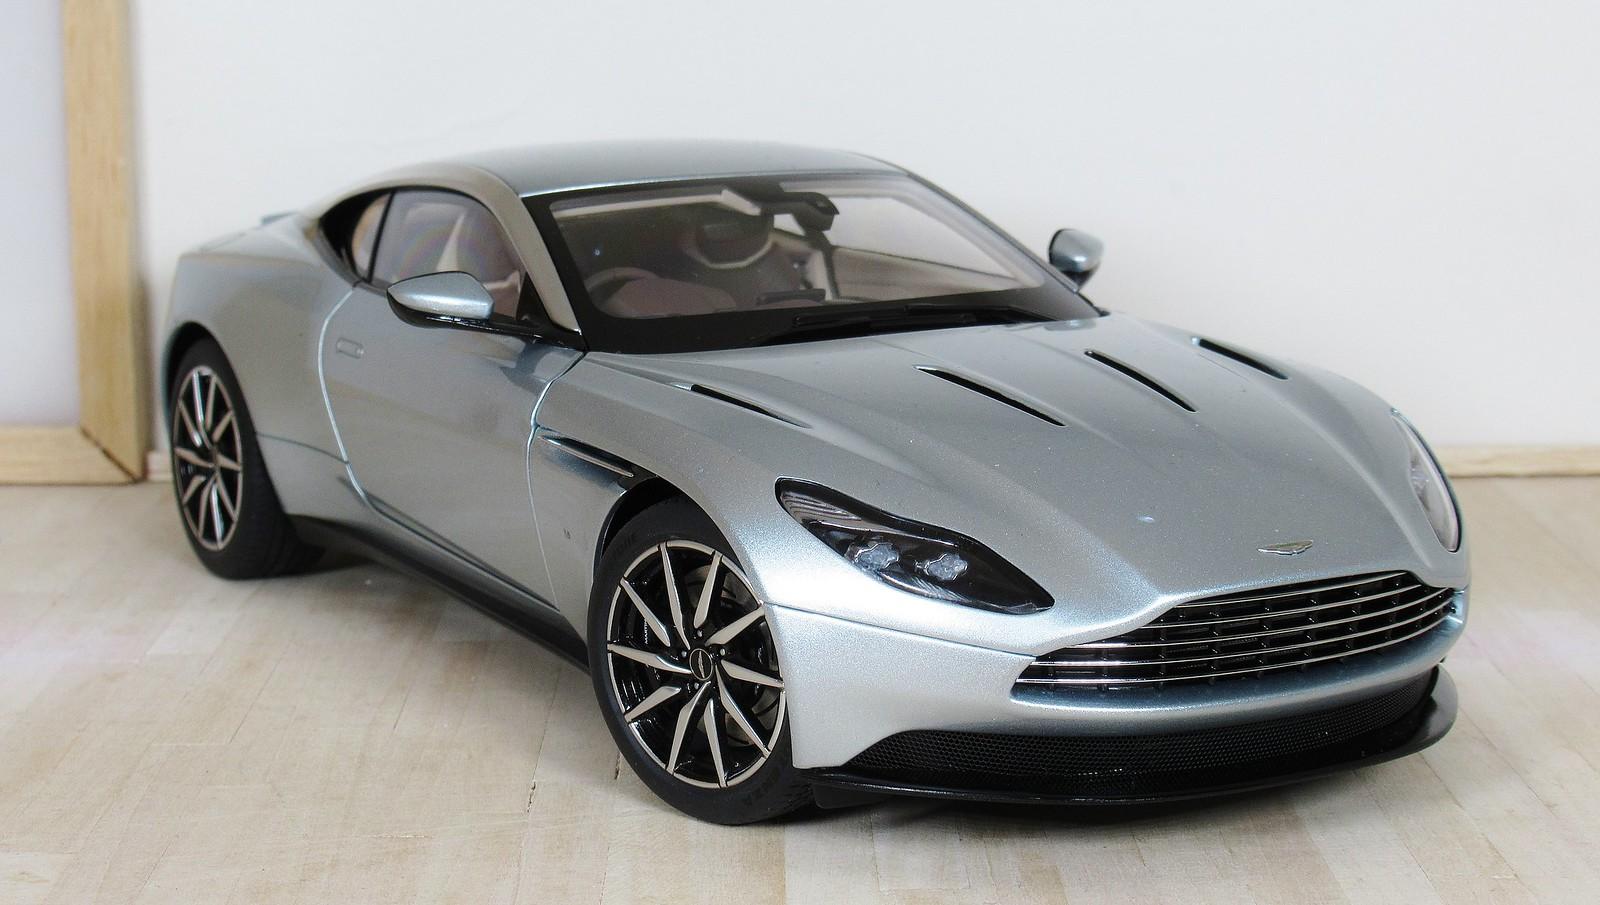 Autoart Aston Martin Db11 Skyfall Silver Aston Martin Diecastxchange Com Diecast Cars Forums